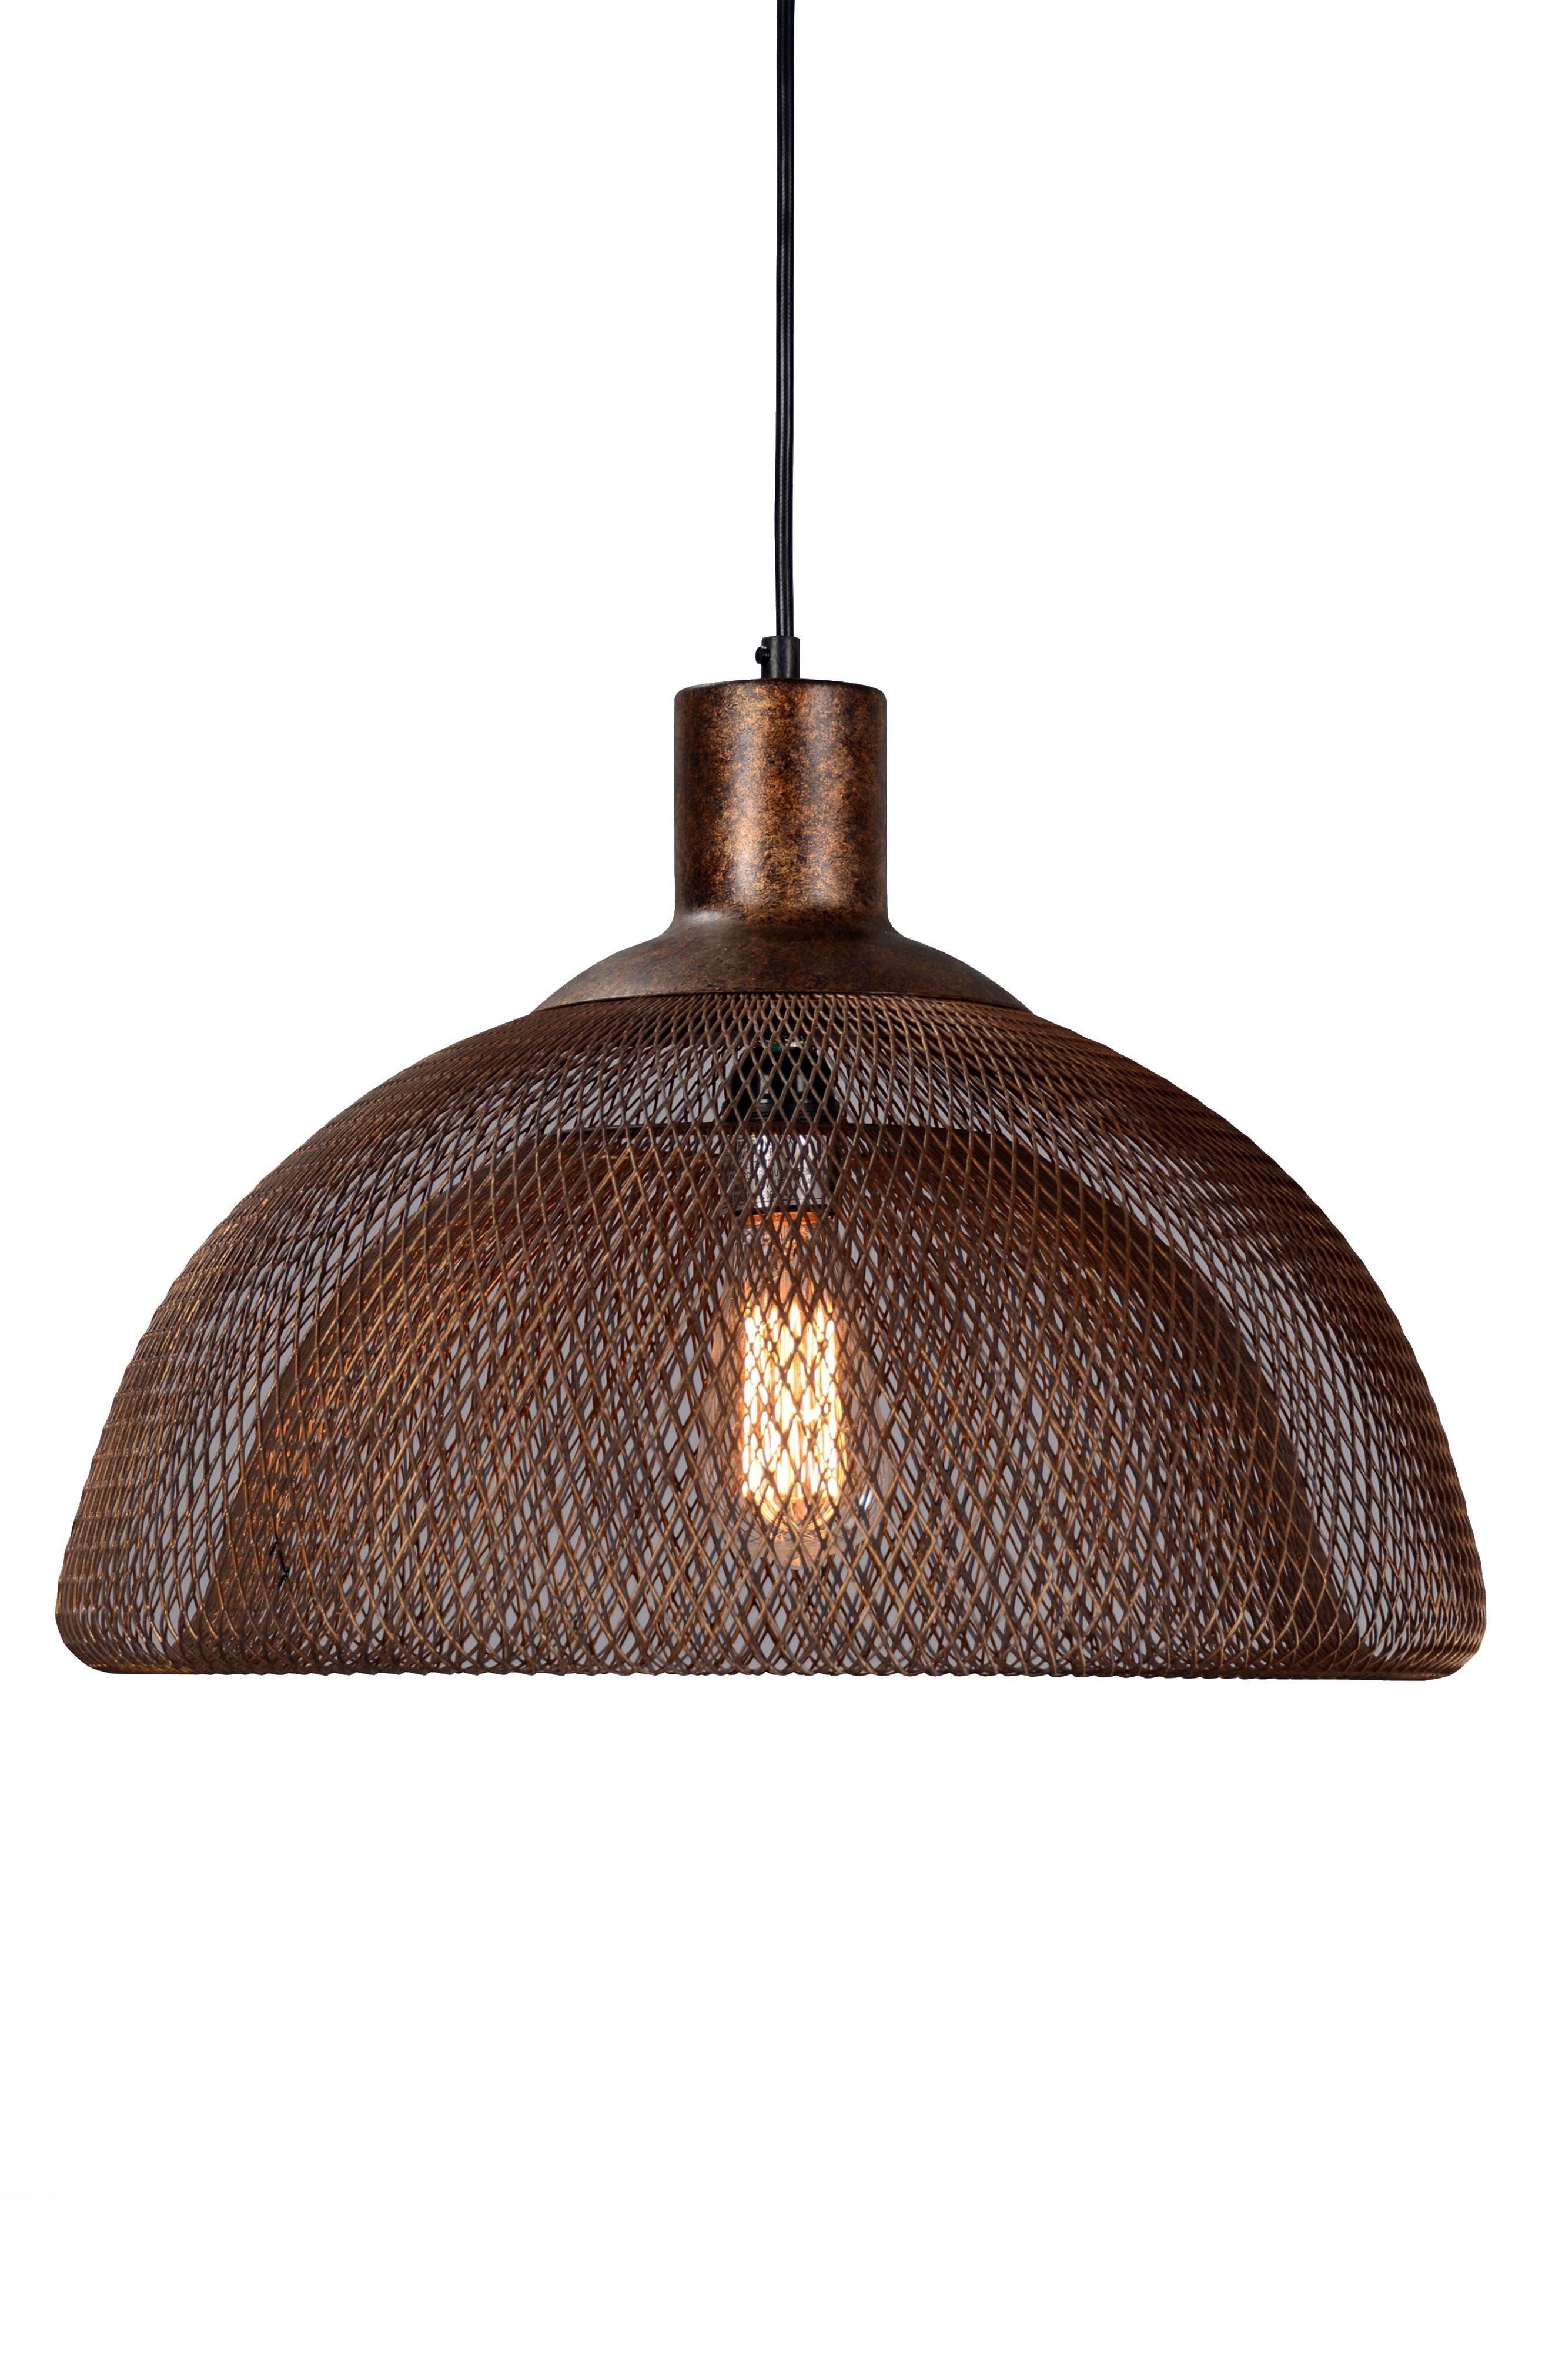 Classic Home Nova Copper Finish Mesh Shade Pendant Lamp Size Large  Brown